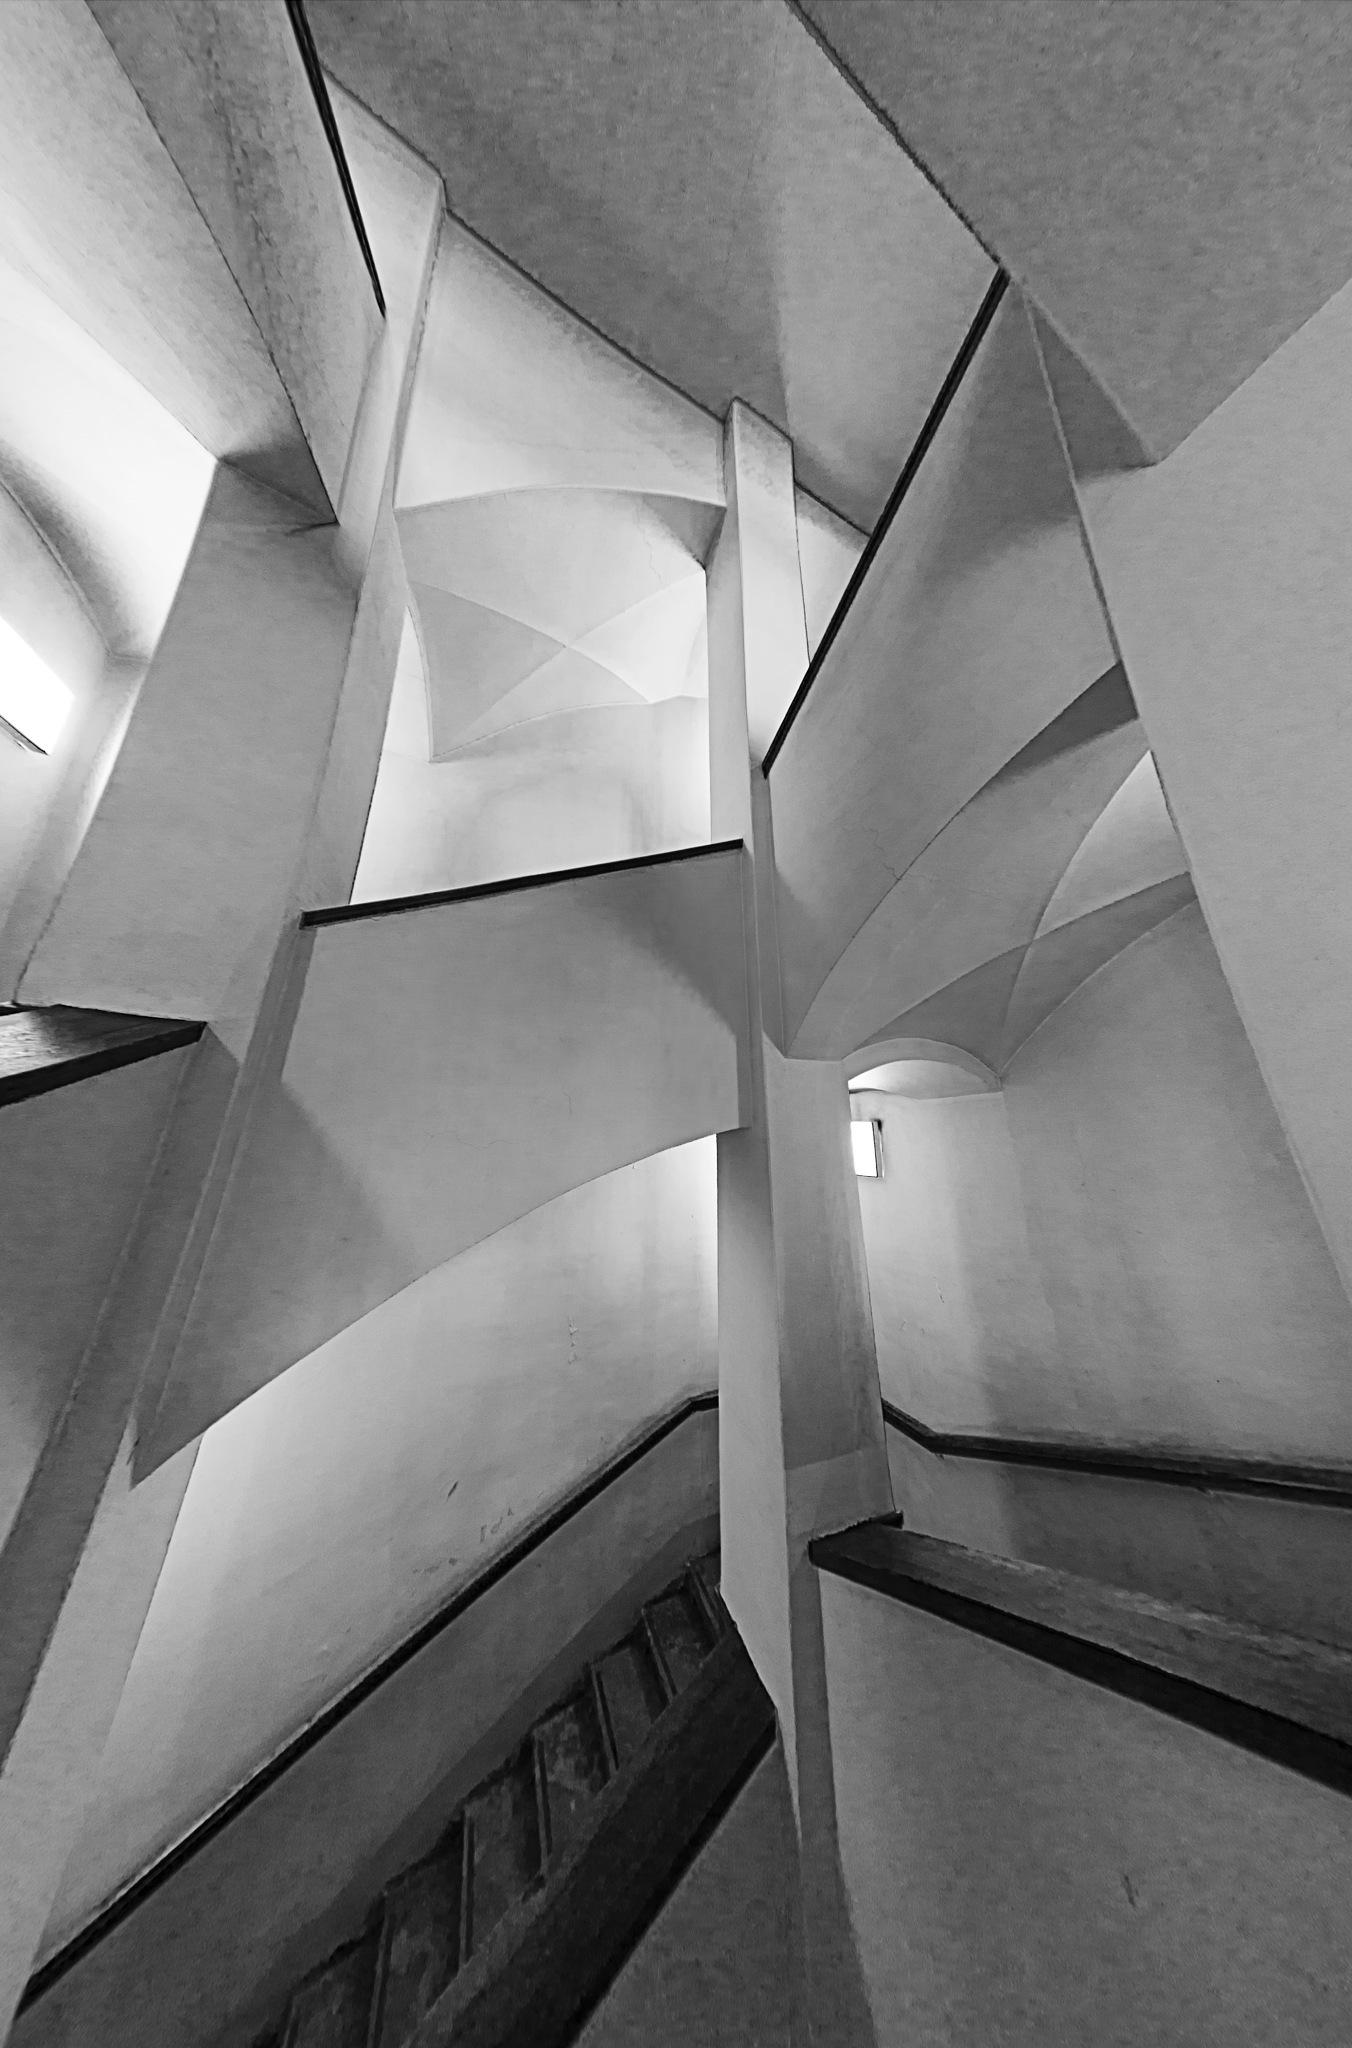 Stairs by dmivamoro